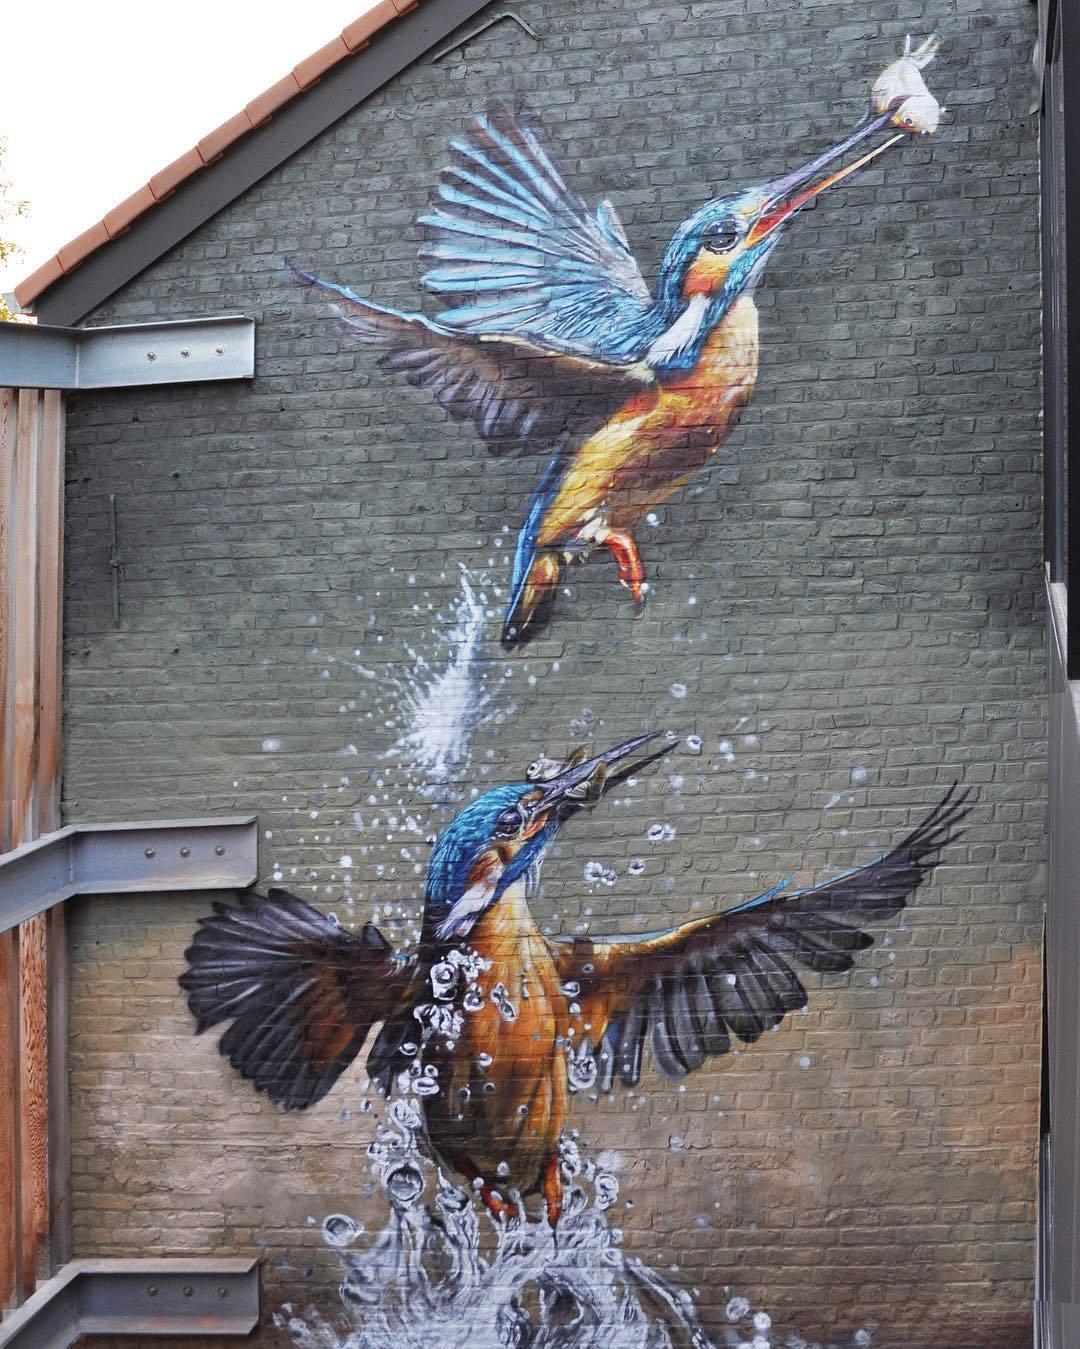 https://www.propaganza.be/wp-content/uploads/2019/04/bart-smeets-smates-ultra-realism-propaganza-urban-artist-graffiti-graff-street-art-spray-painting-belgique-1.jpg